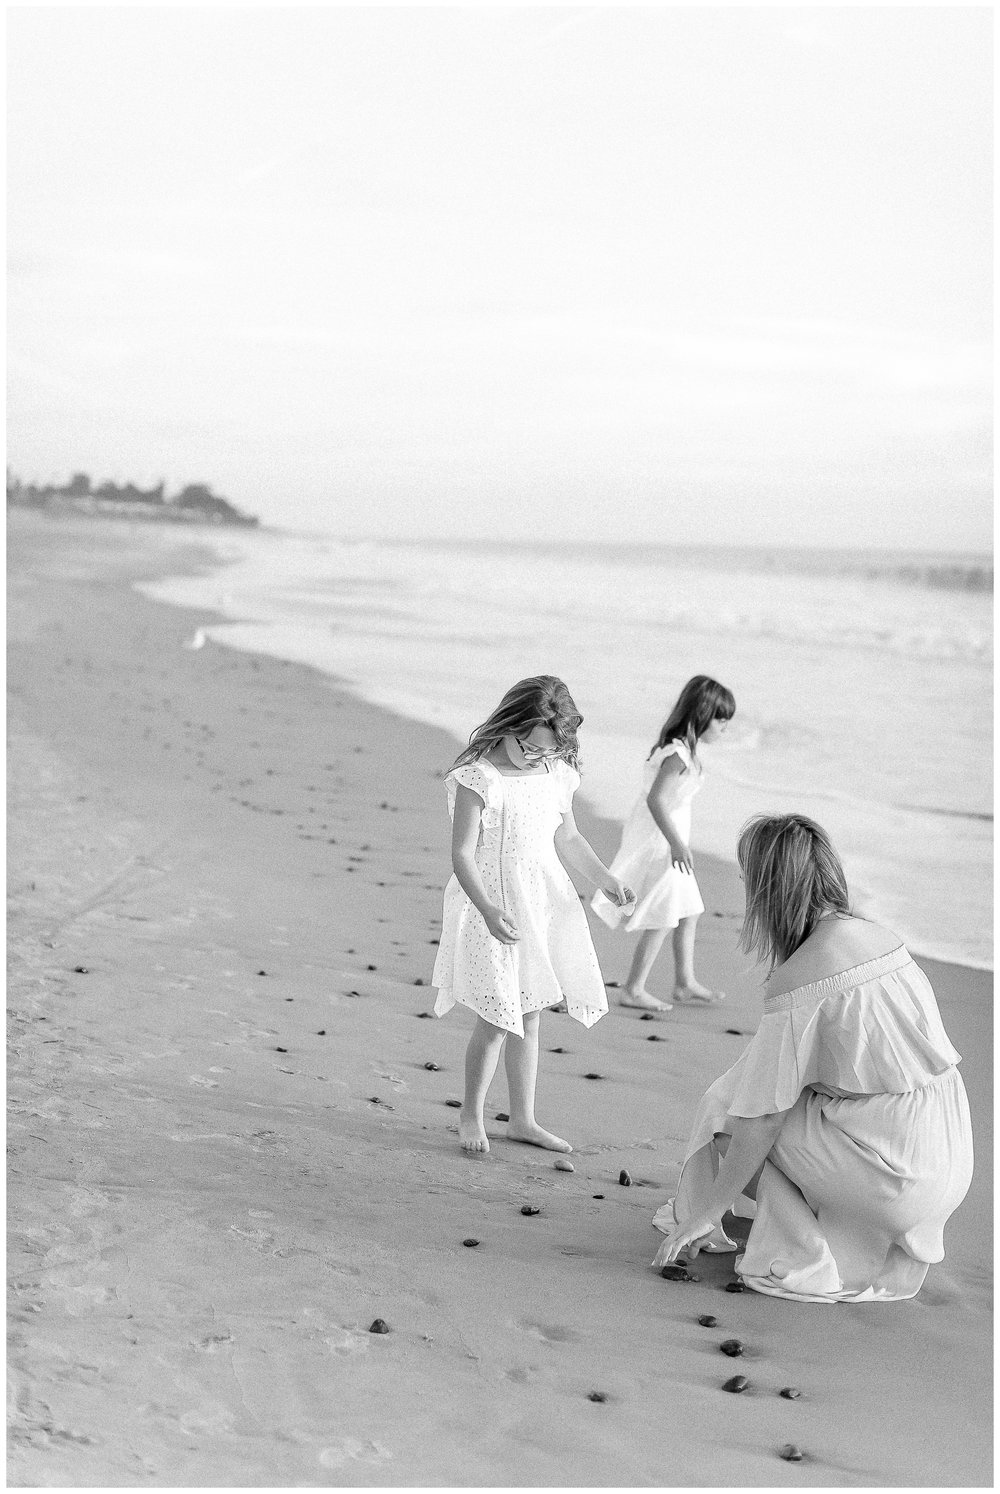 San_clemente_family_session_Orange_county_family_photographer_cori_kleckner_photography_laguna_beach_family_session_0686.jpg